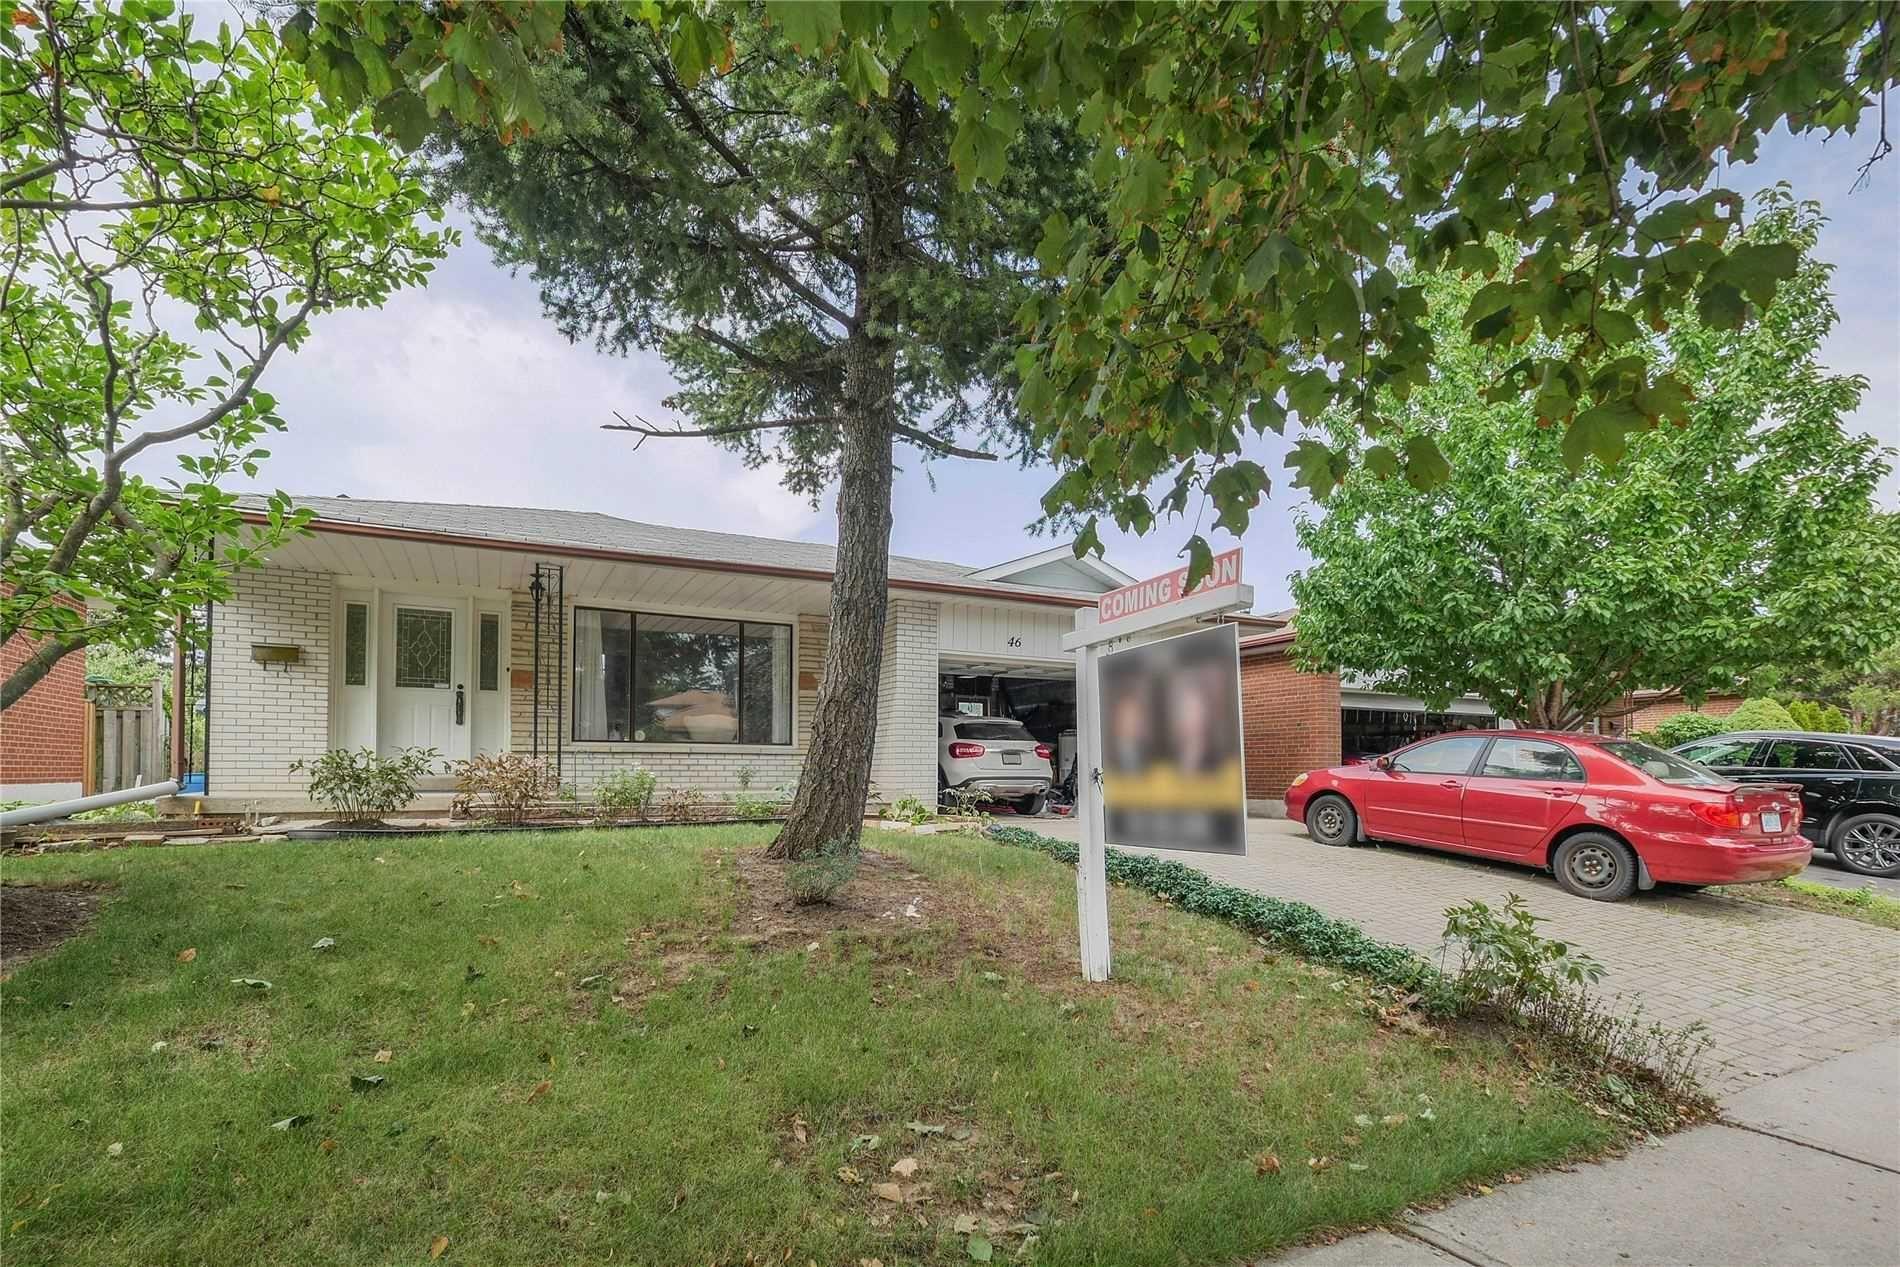 Main Photo: 46 Stainforth Drive in Toronto: Agincourt South-Malvern West House (Backsplit 4) for sale (Toronto E07)  : MLS®# E5368790